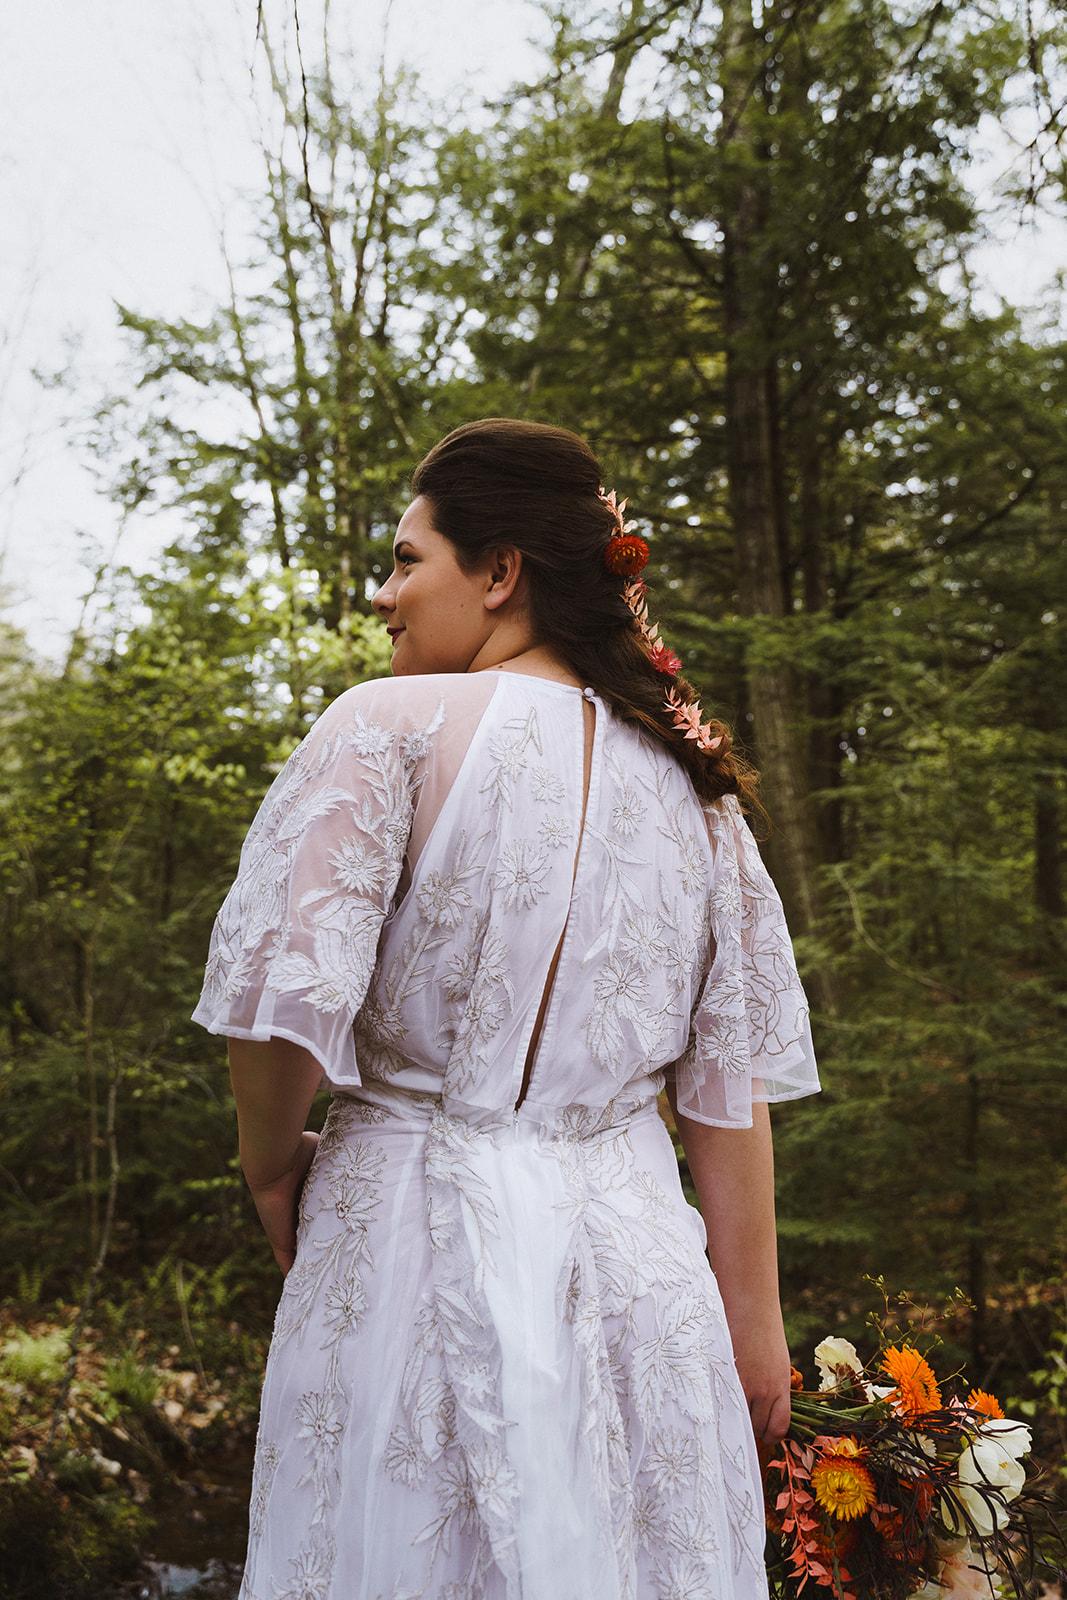 Tuckaway Tree Farm Lebanon Maine Wedding Inspiration 31